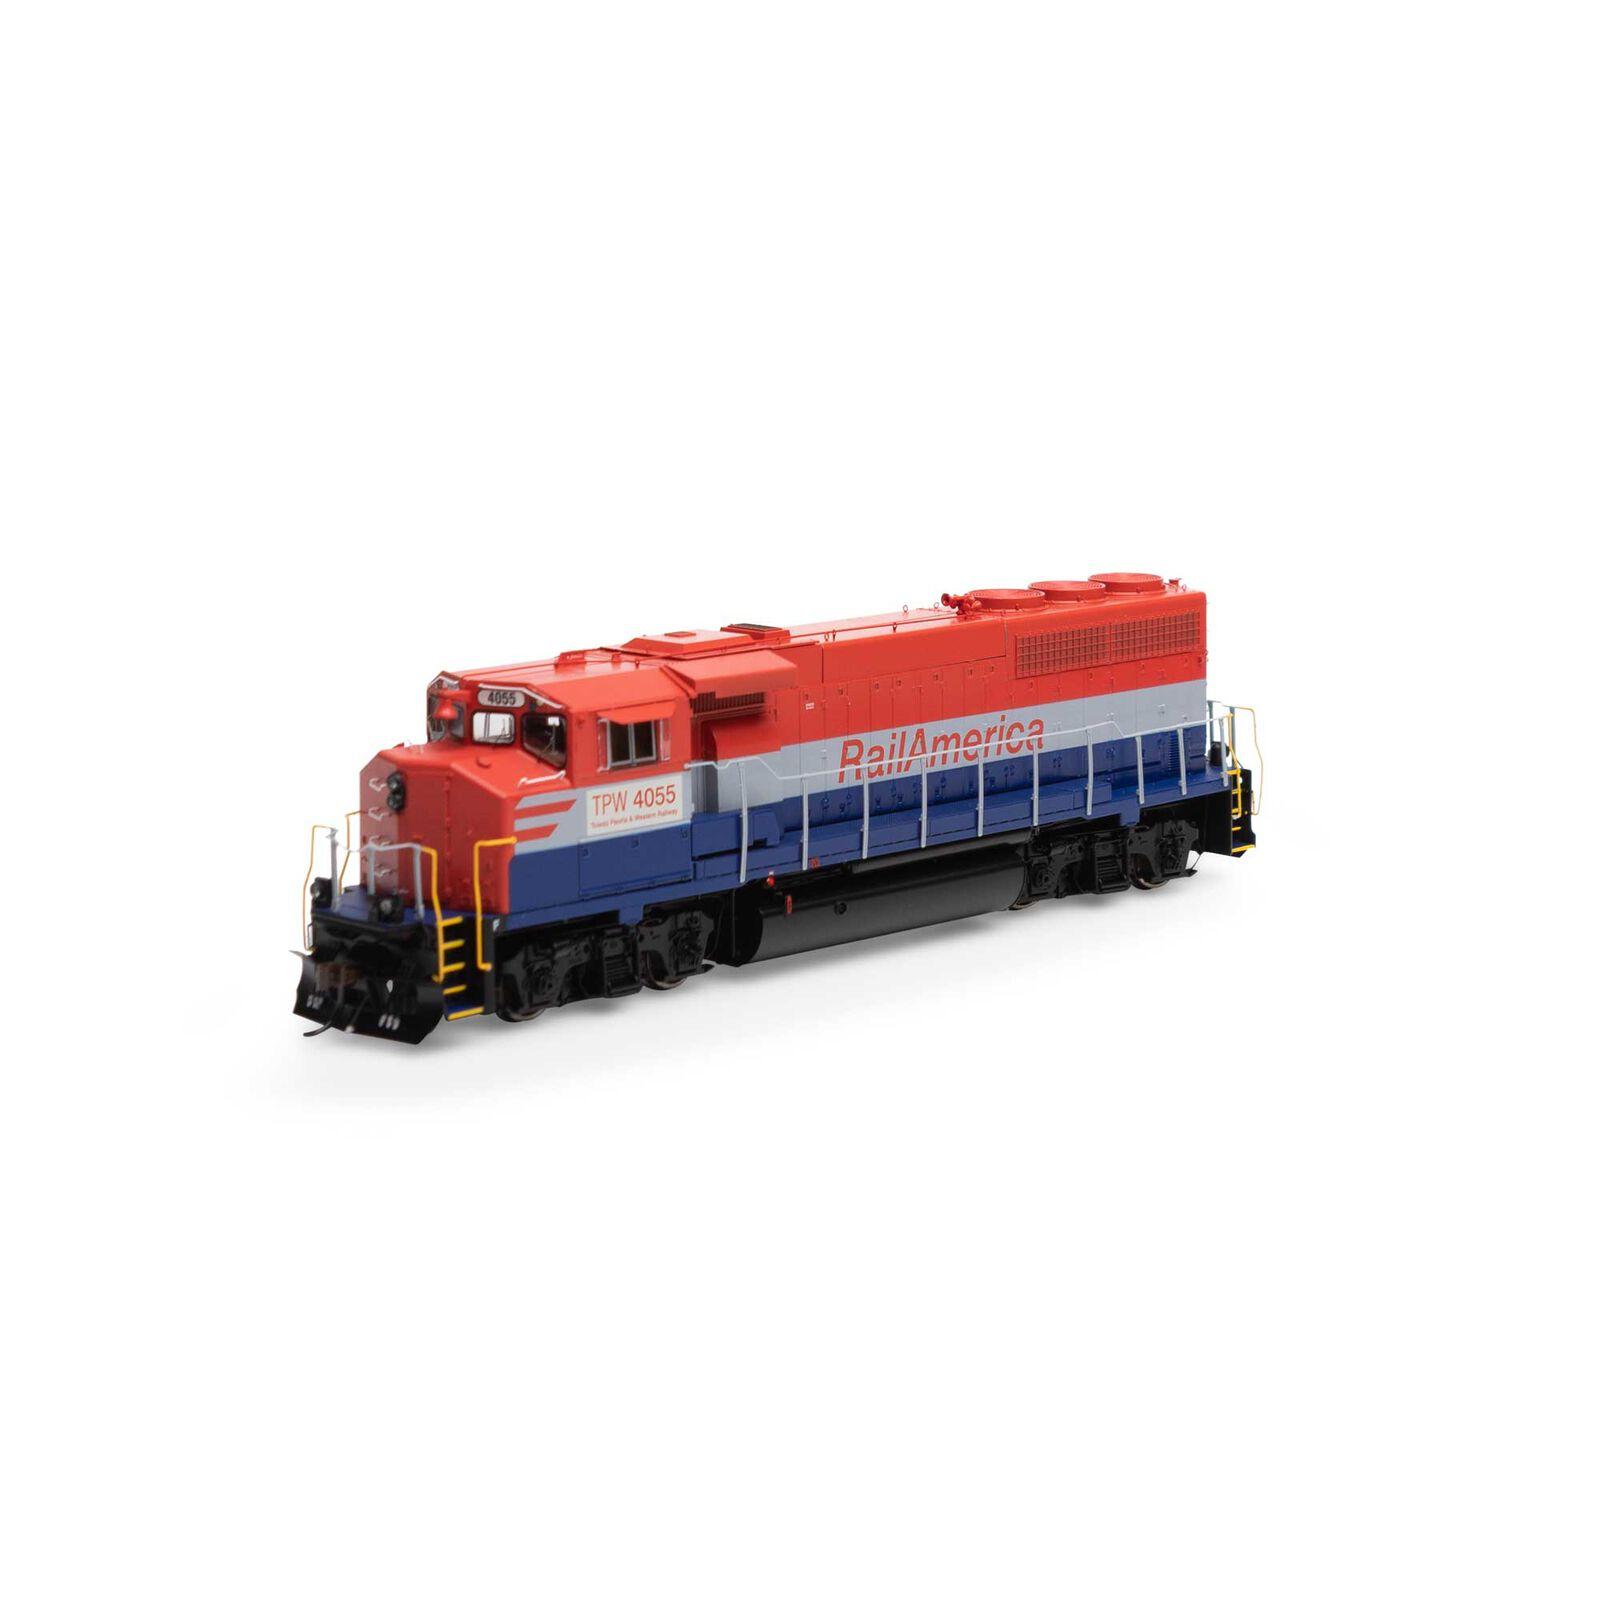 HO GP40-2L with DCC & Sound, Rail America/TP&W #4055